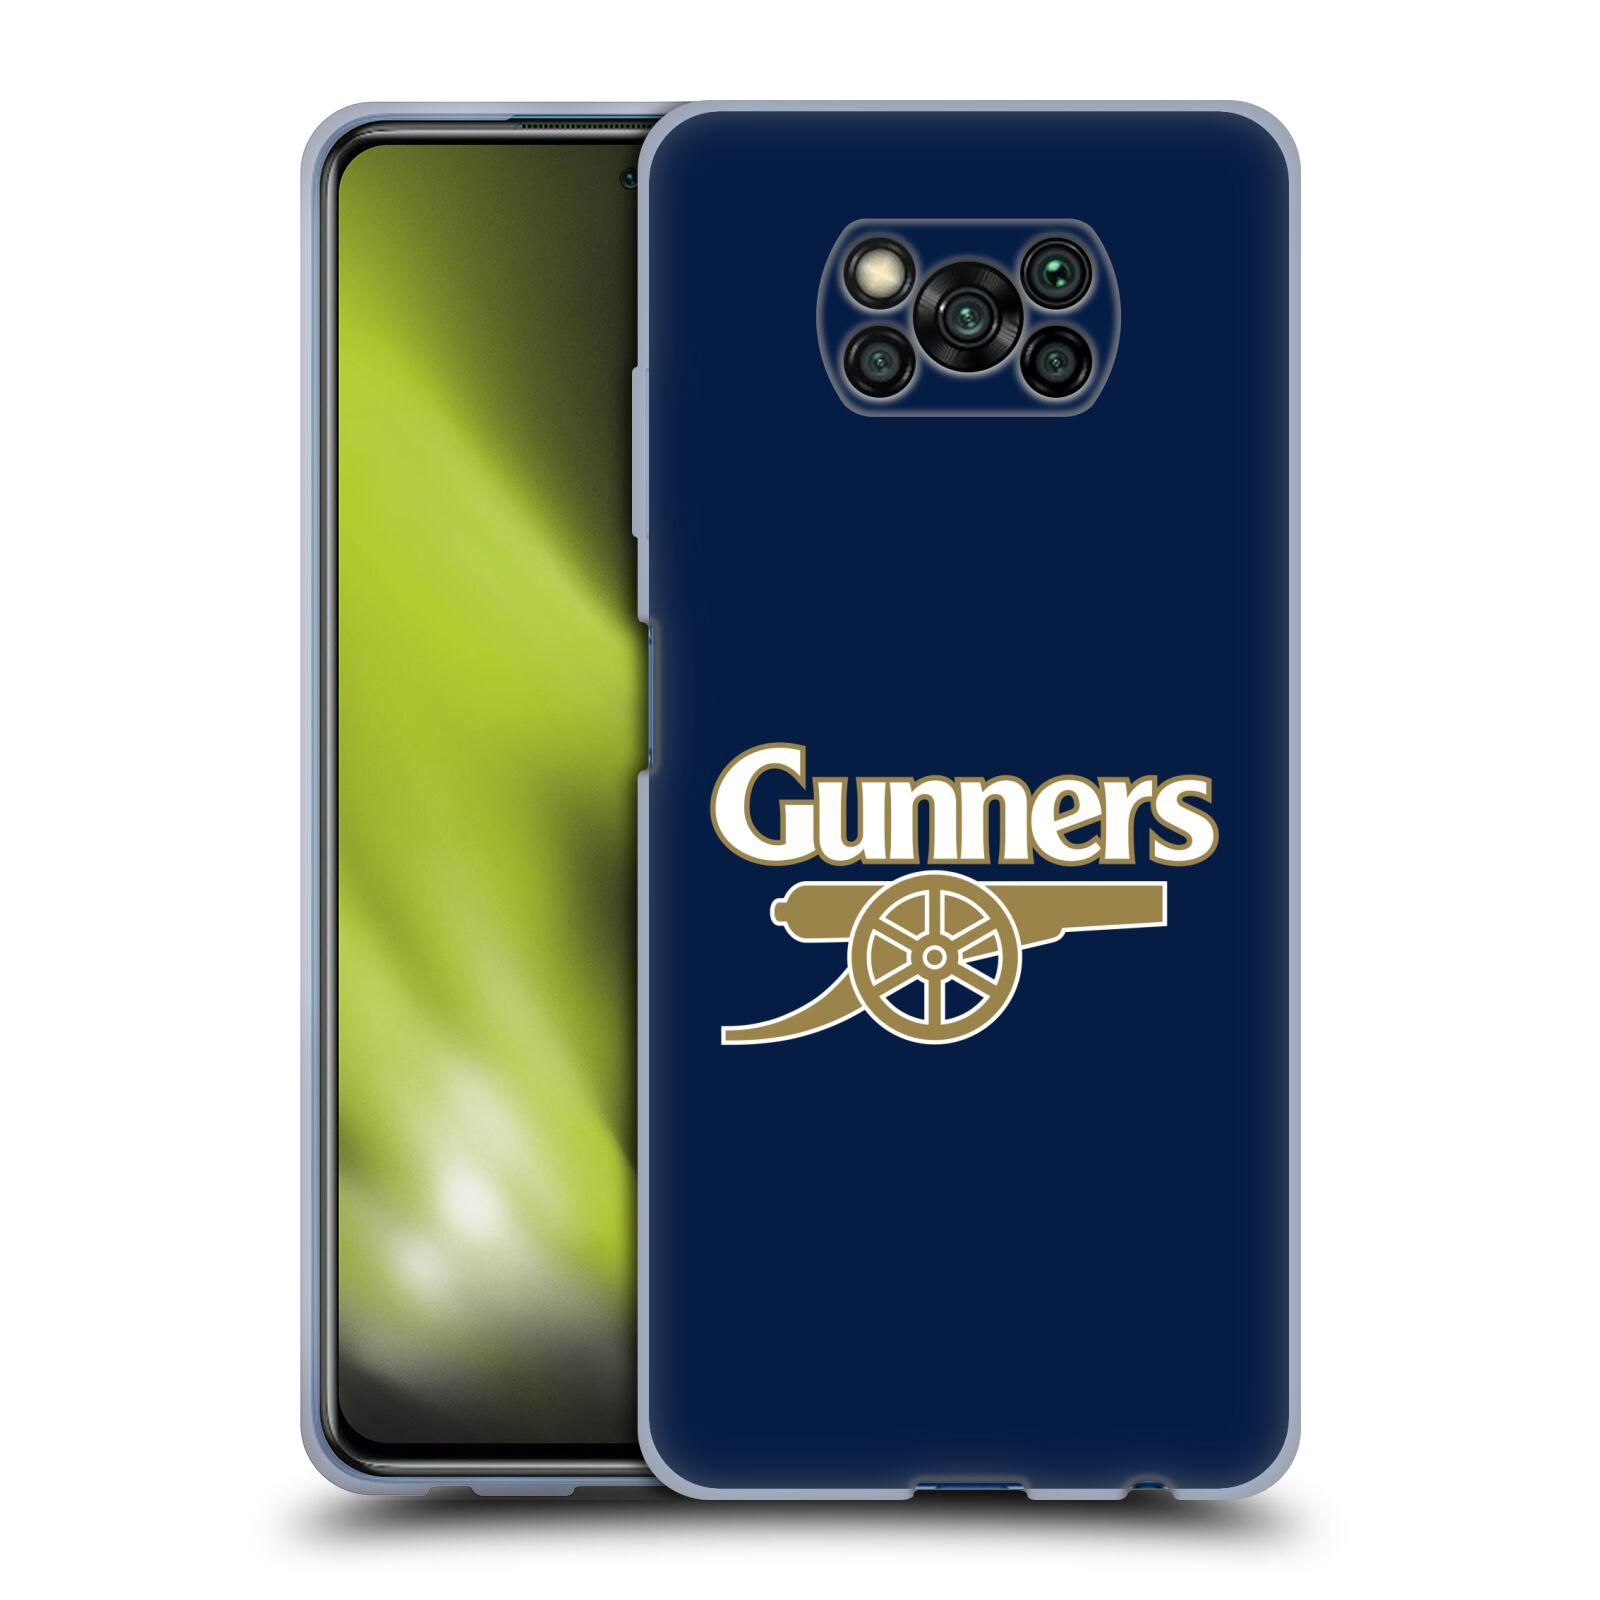 Silikonové pouzdro na mobil Xiaomi Poco X3 NFC - Head Case - Arsenal FC - Gunners